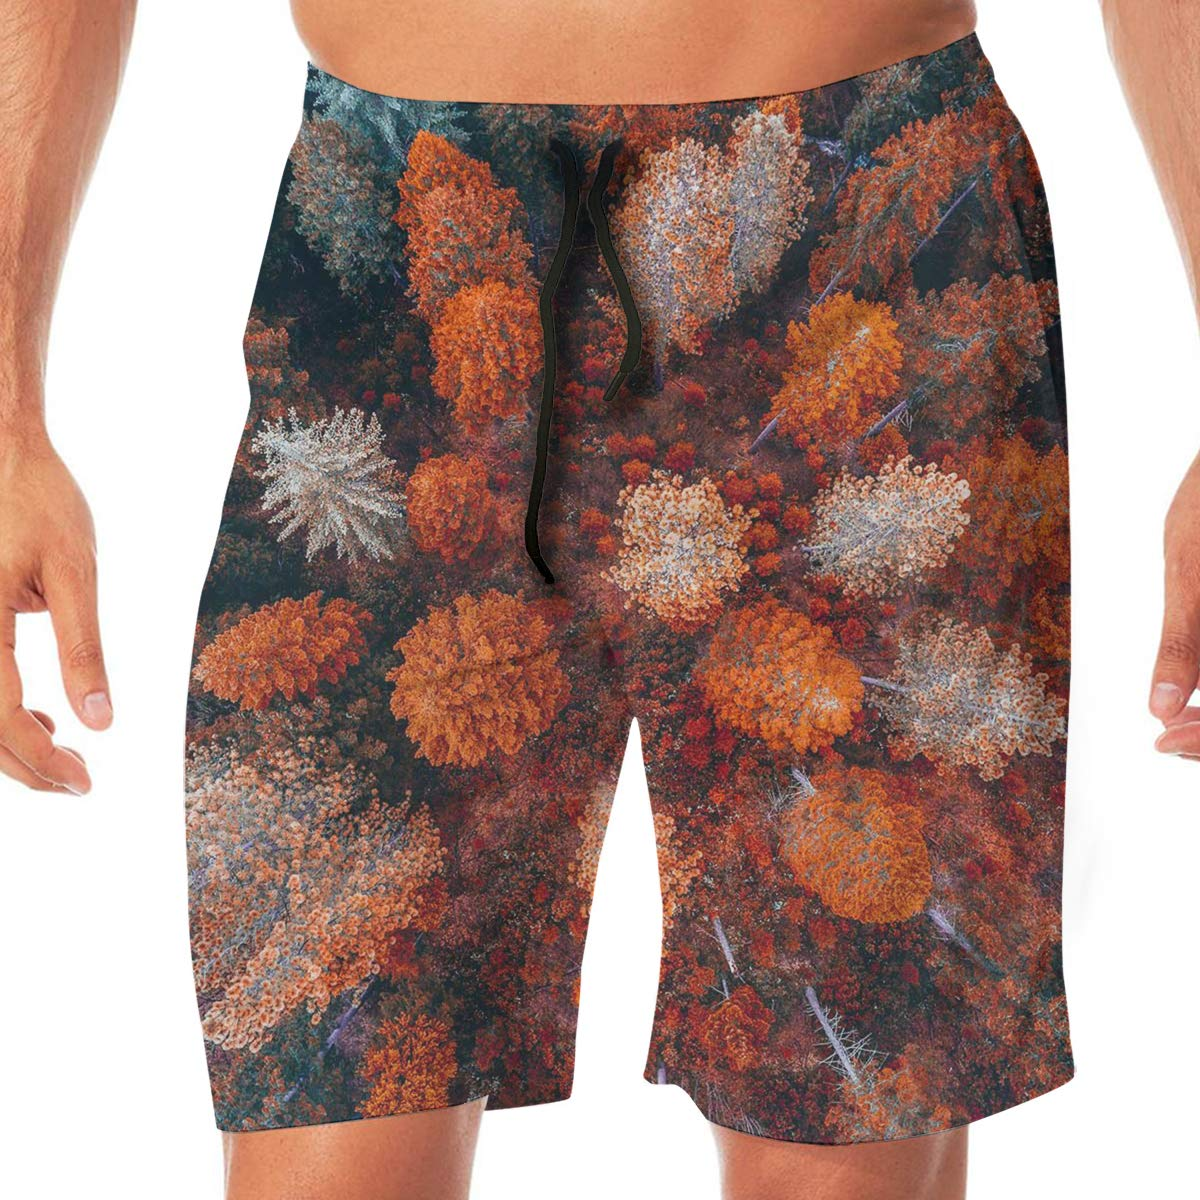 SEXTDSFD Autumn Aesthetic Mens Running Casual Short Beach Pants Swim Trunks Drawstring Board Shorts Swimwear